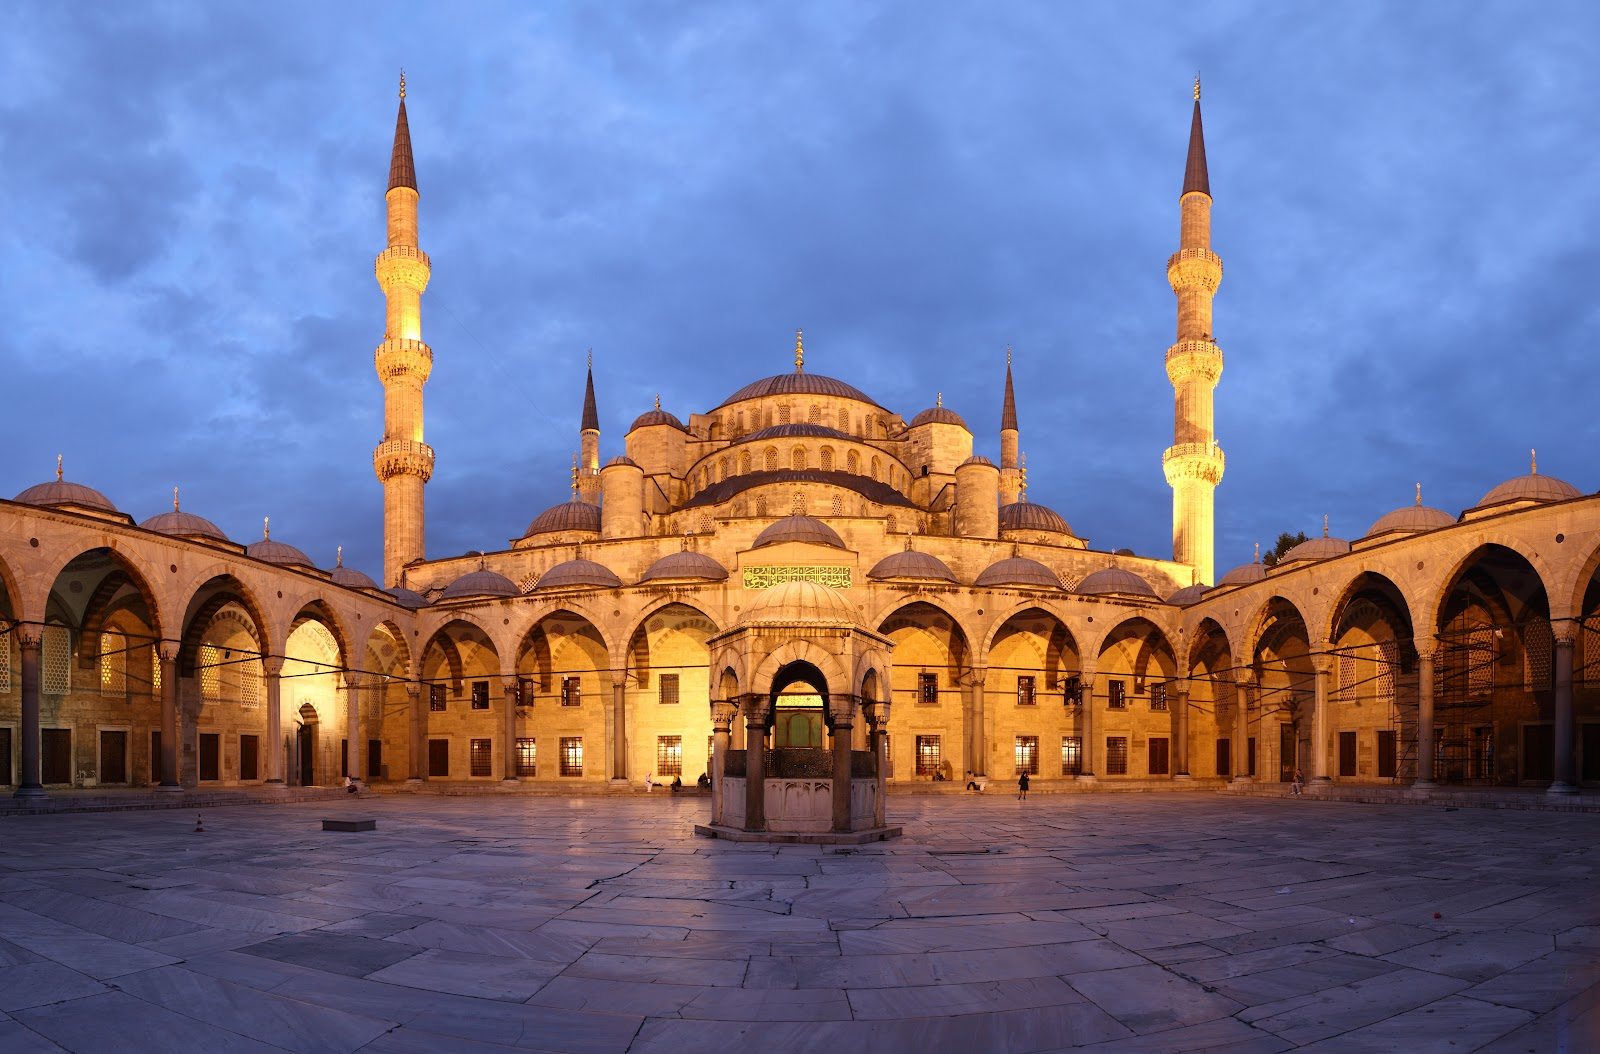 Blue_Mosque_Courtyard_Dusk_Wikimedia_Commons